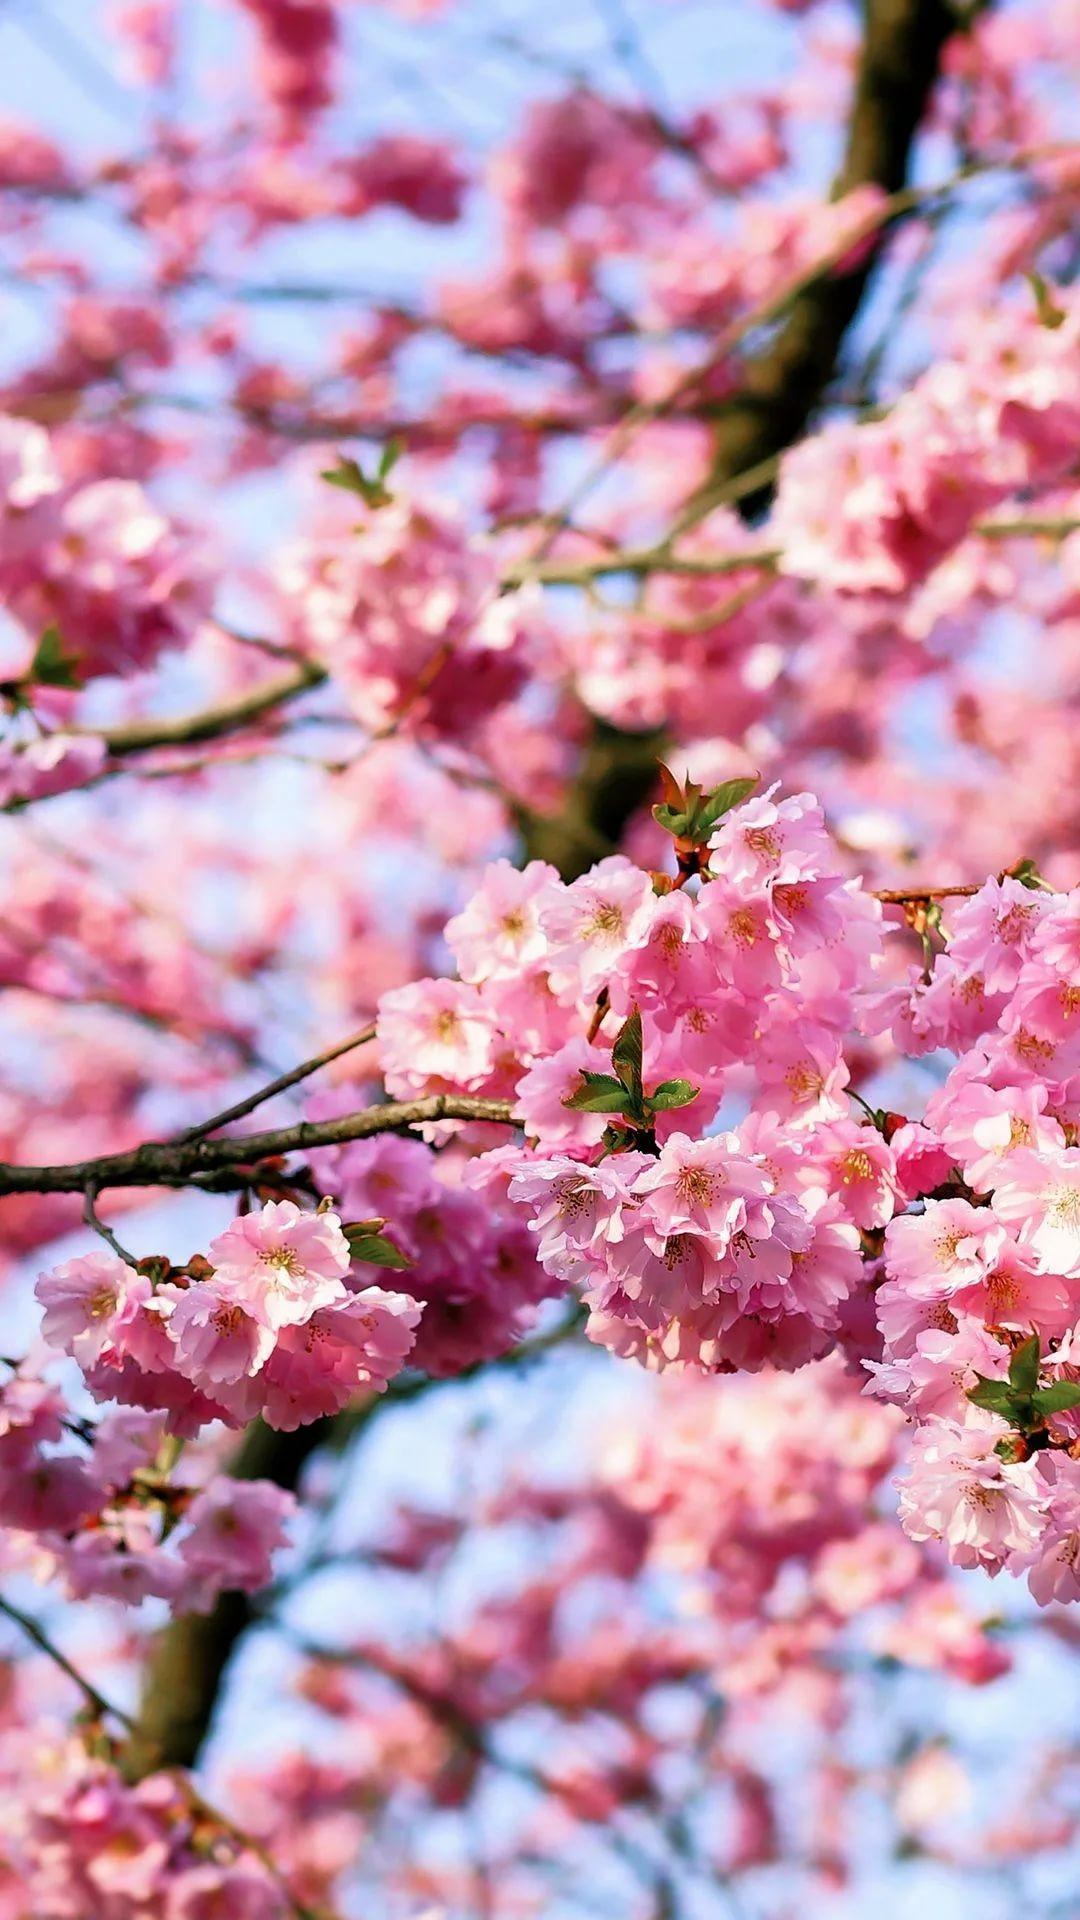 Красивые hd обои весна на телефон 3